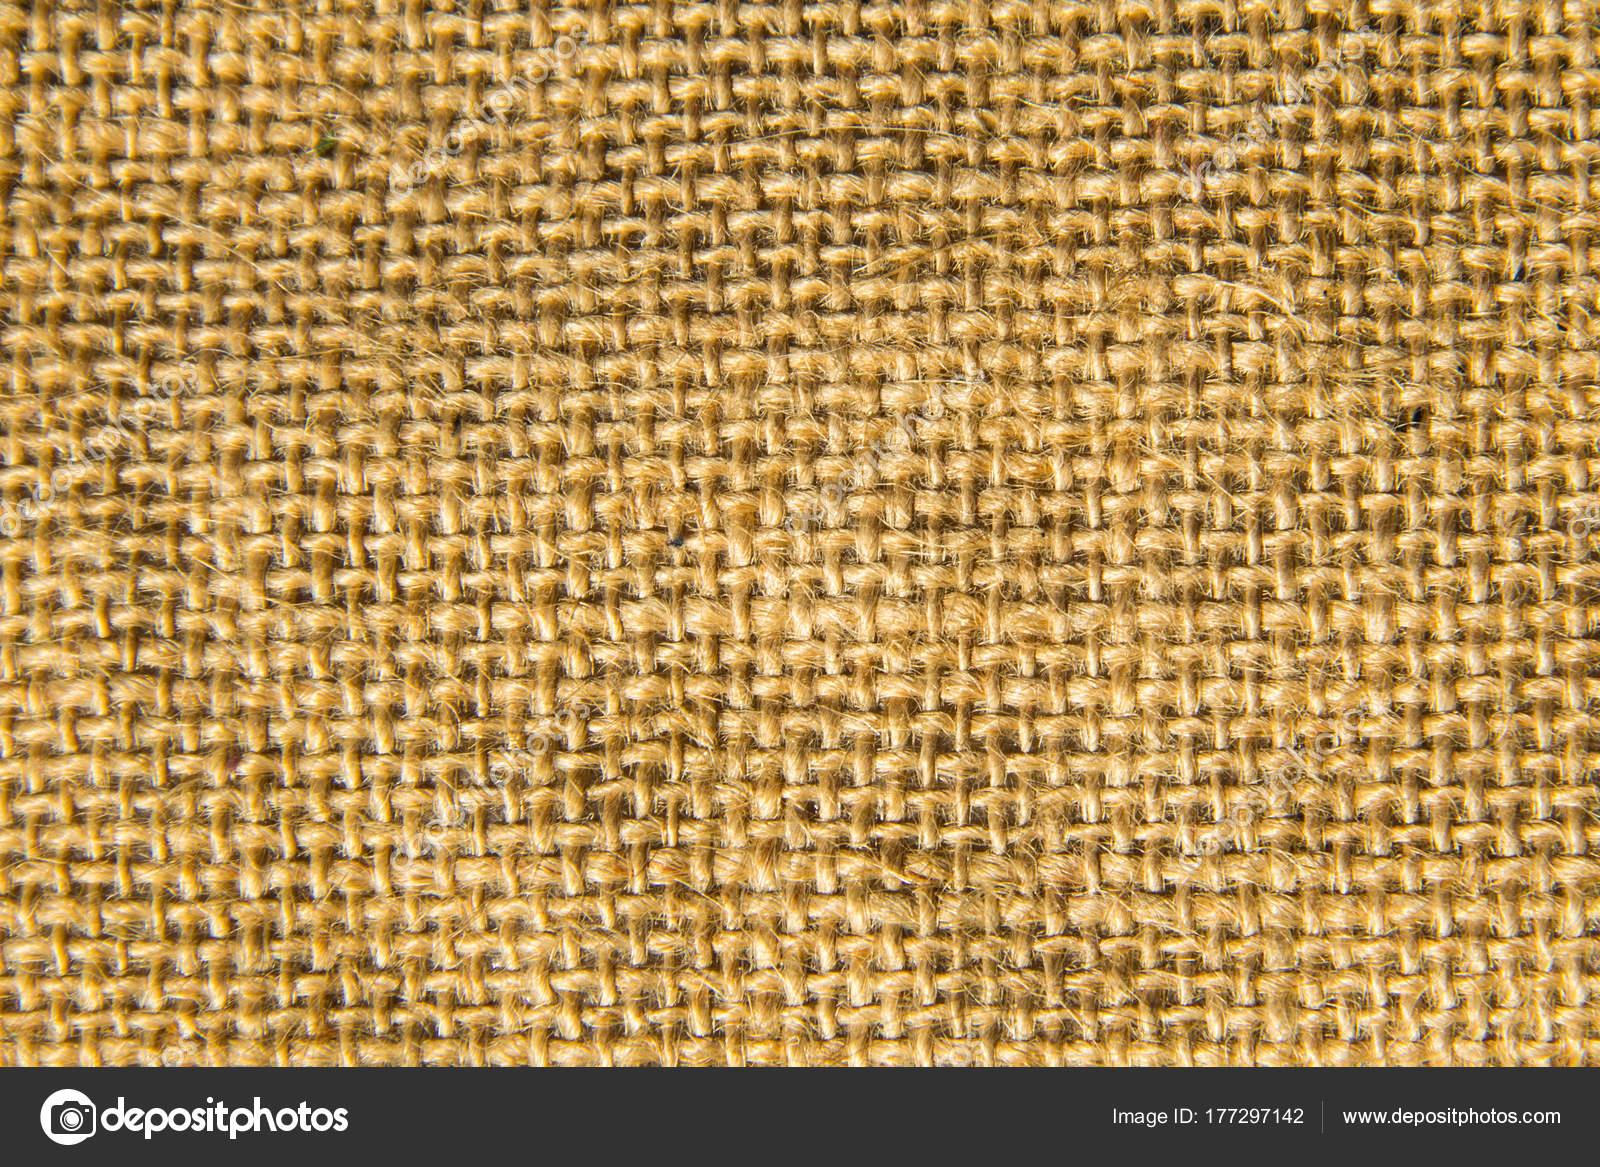 Fondo de tela de saco. Textura de la tela rústica — Foto de stock